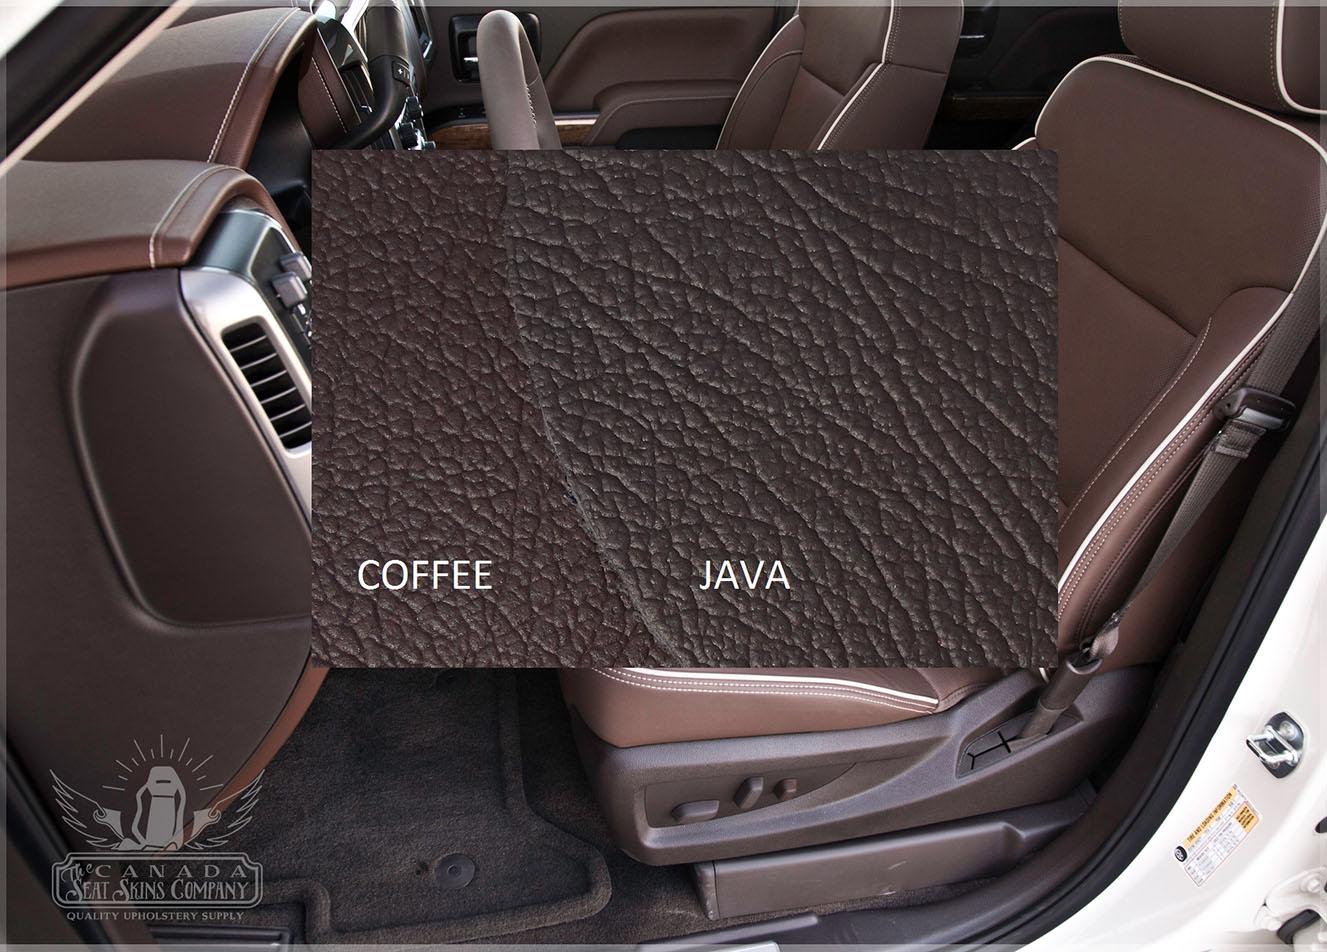 2014 2018 Chevrolet Silverado Limited Edition Leather